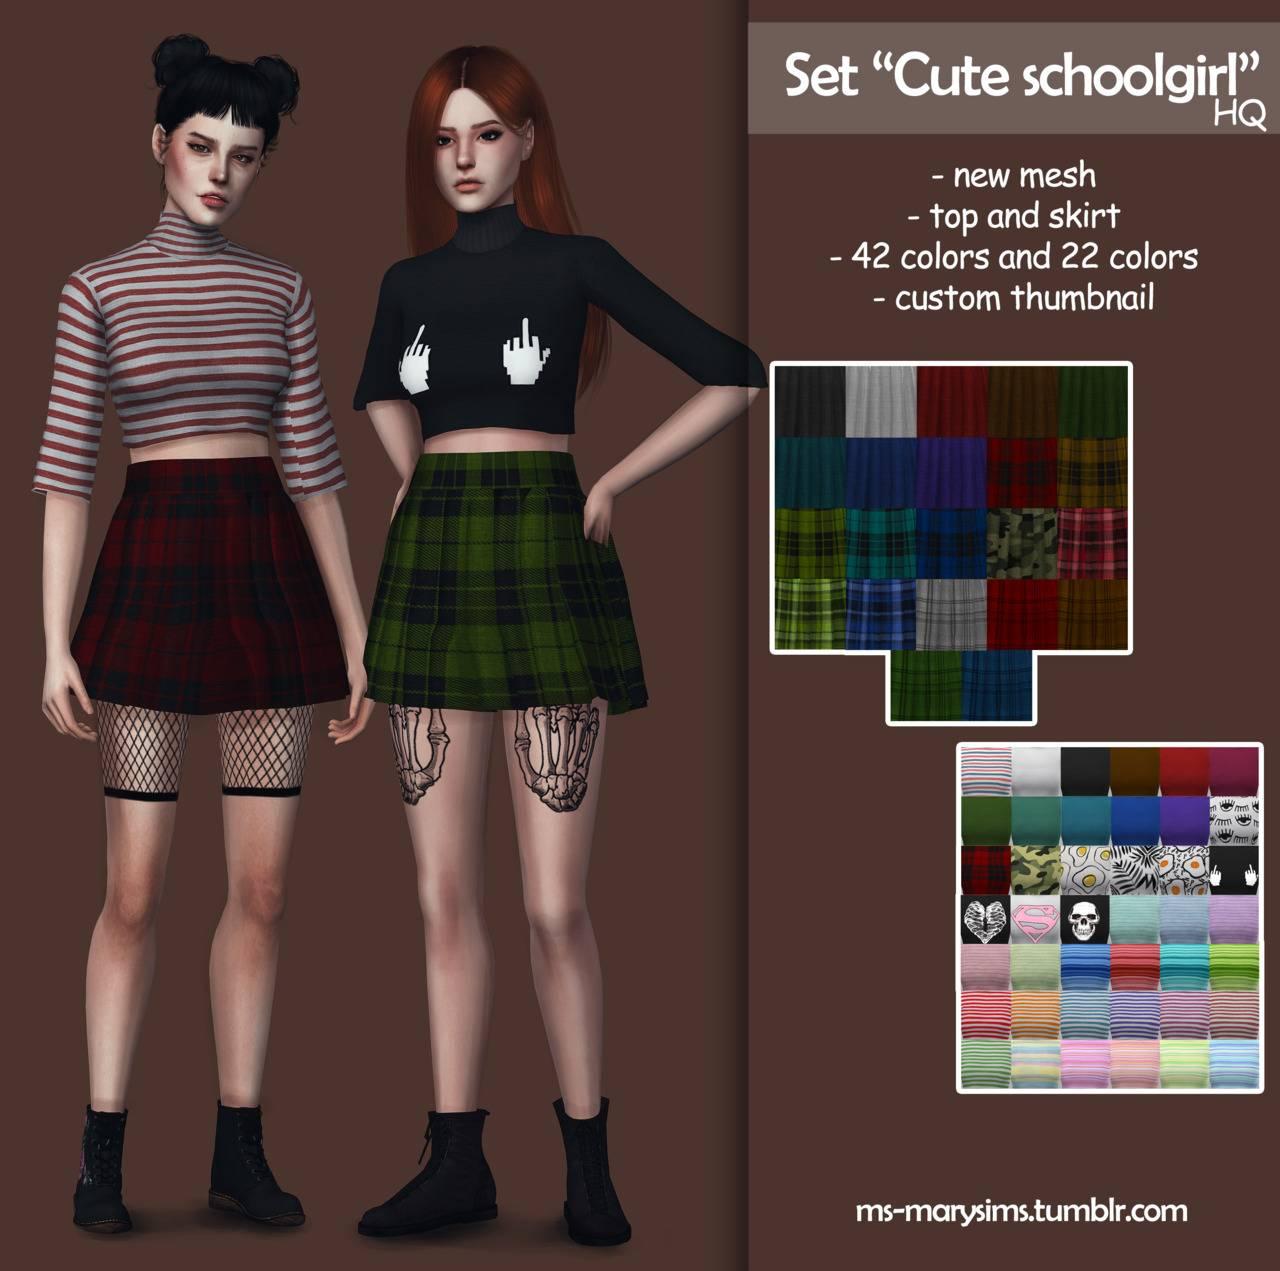 Топ и юбка - Cute schoolgirl